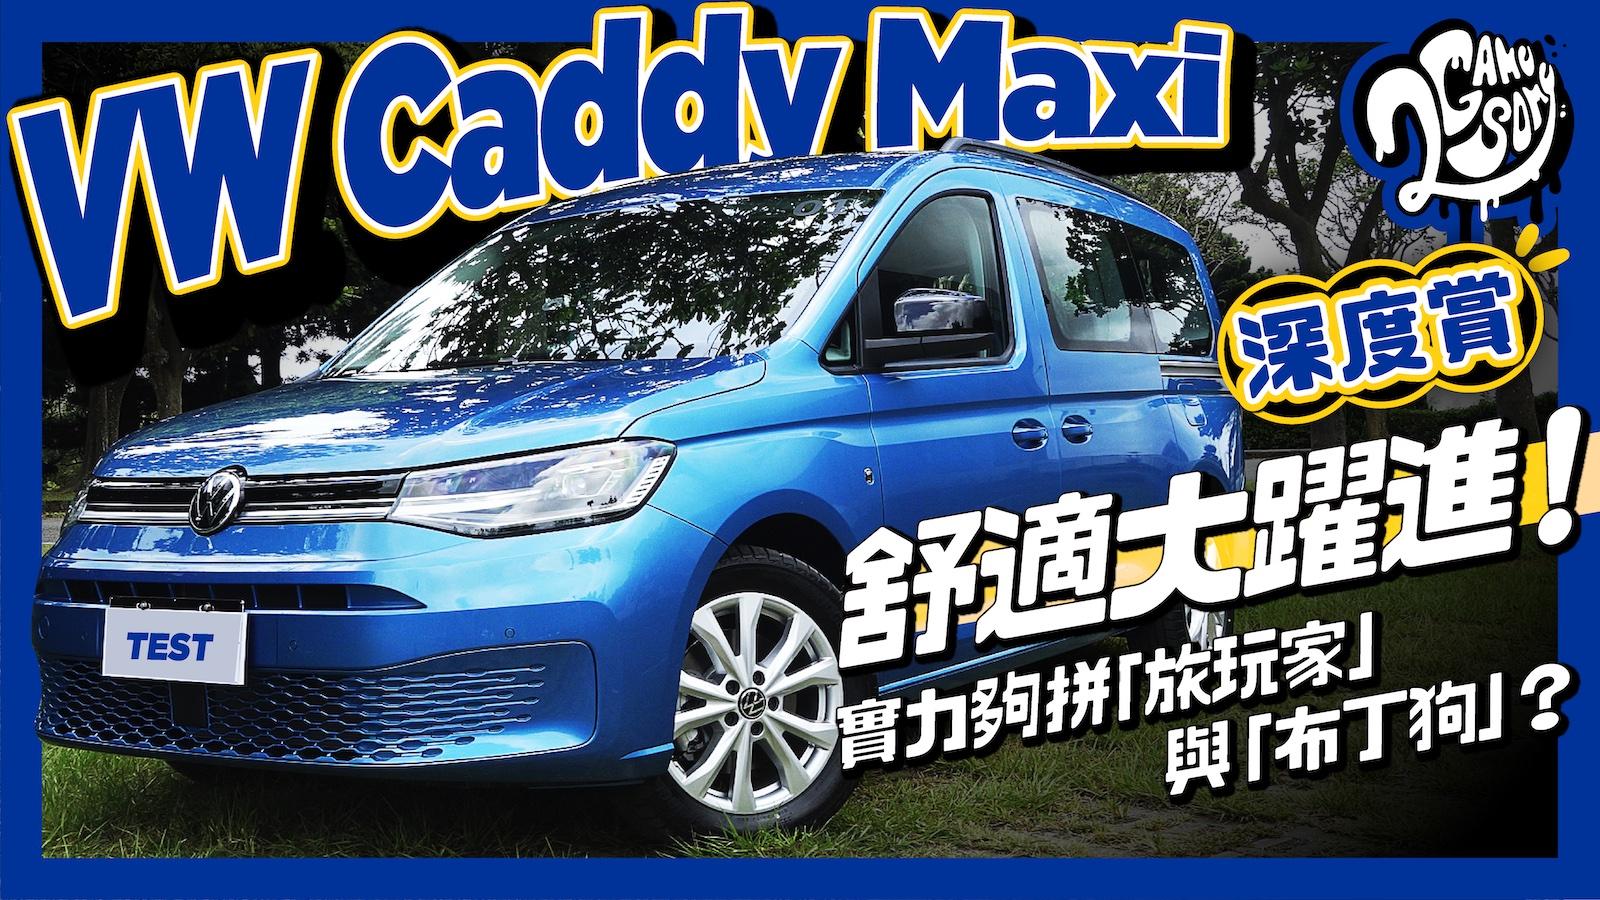 VW Caddy Maxi 深度賞|舒適大躍進!實力夠拼「旅玩家」與「布丁狗」嗎?